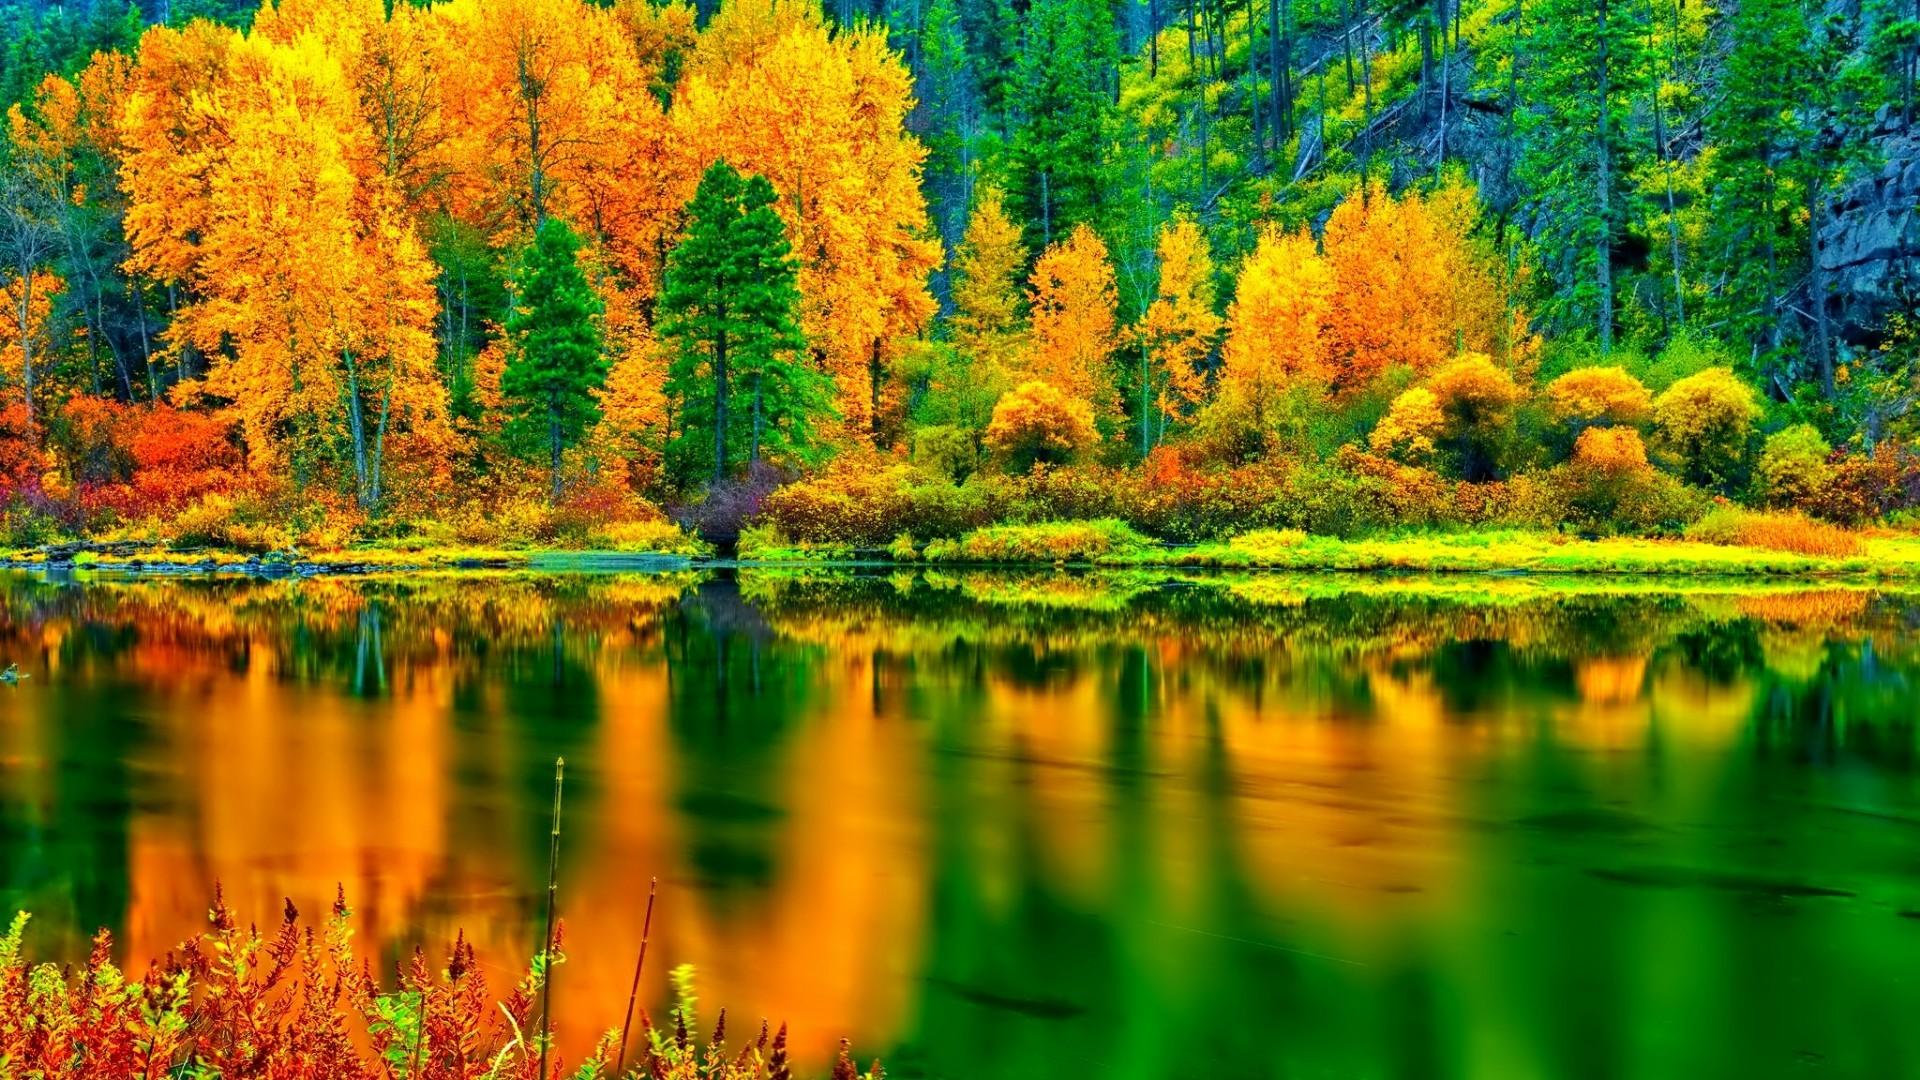 Autumn Landscape Wallpaper ·① WallpaperTag